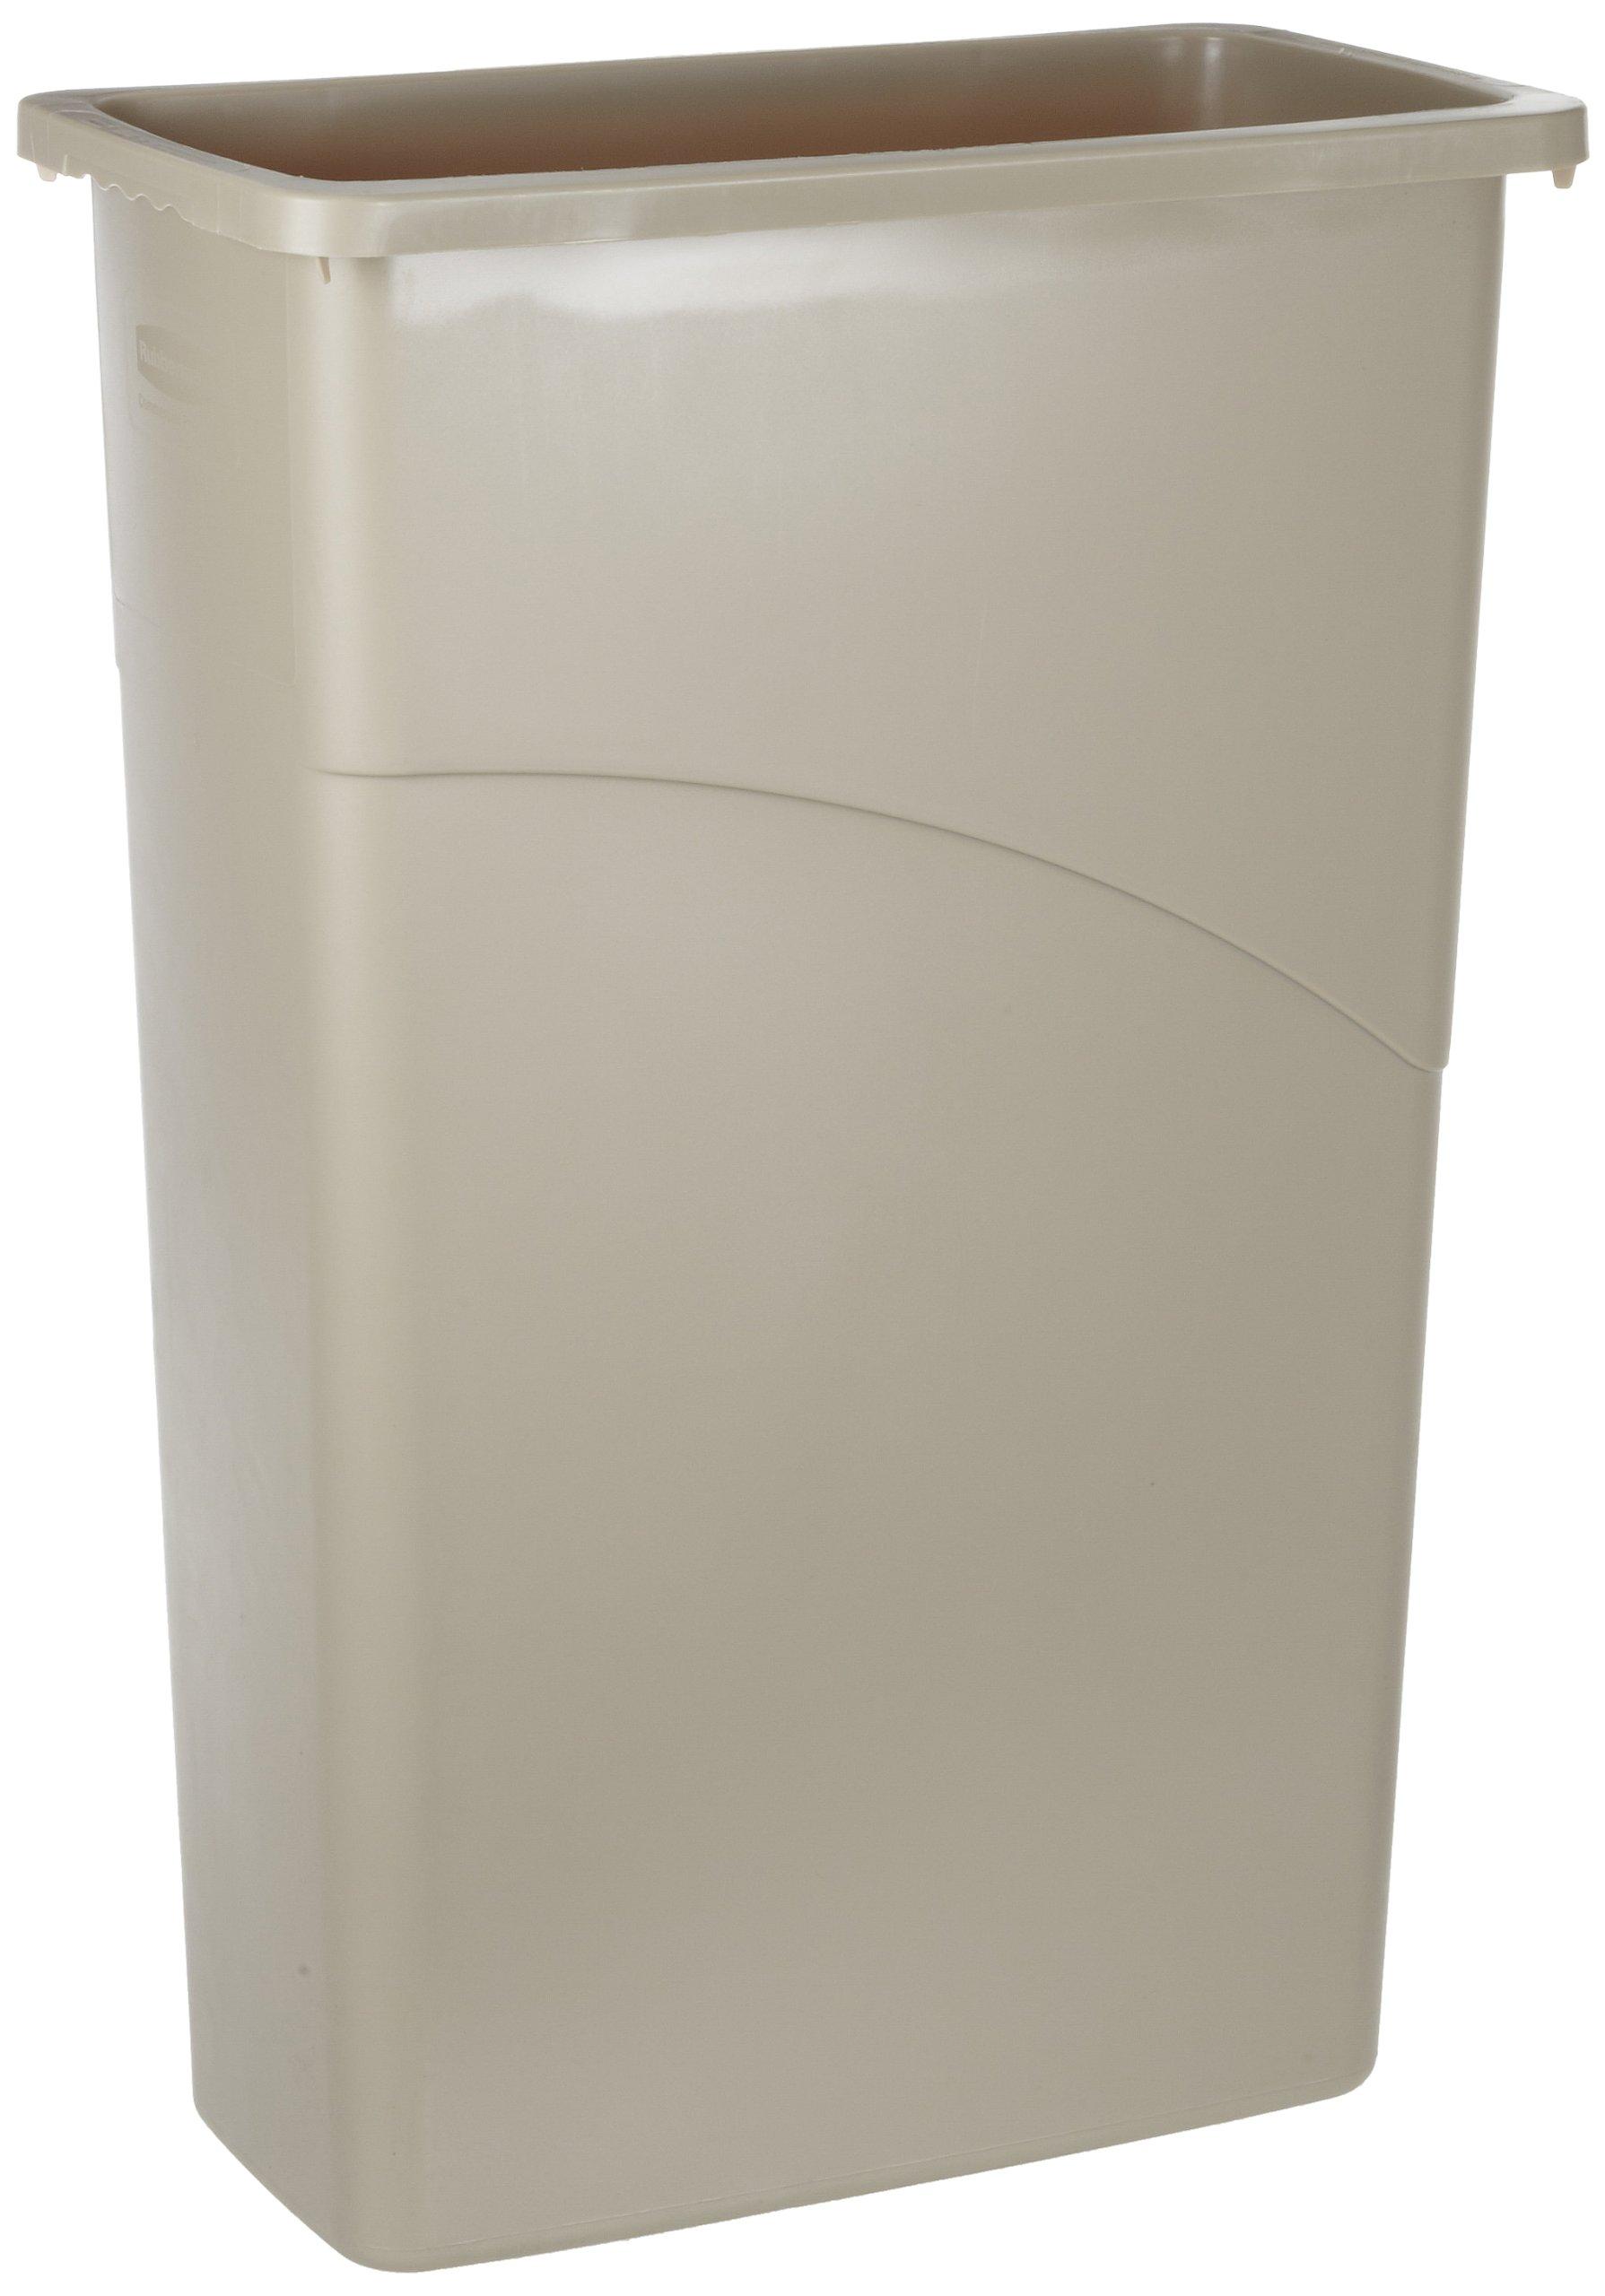 Rubbermaid Commercial Slim Jim Waste Container, Rectangular, Plastic, 23 Gallons, Beige (354000BG)